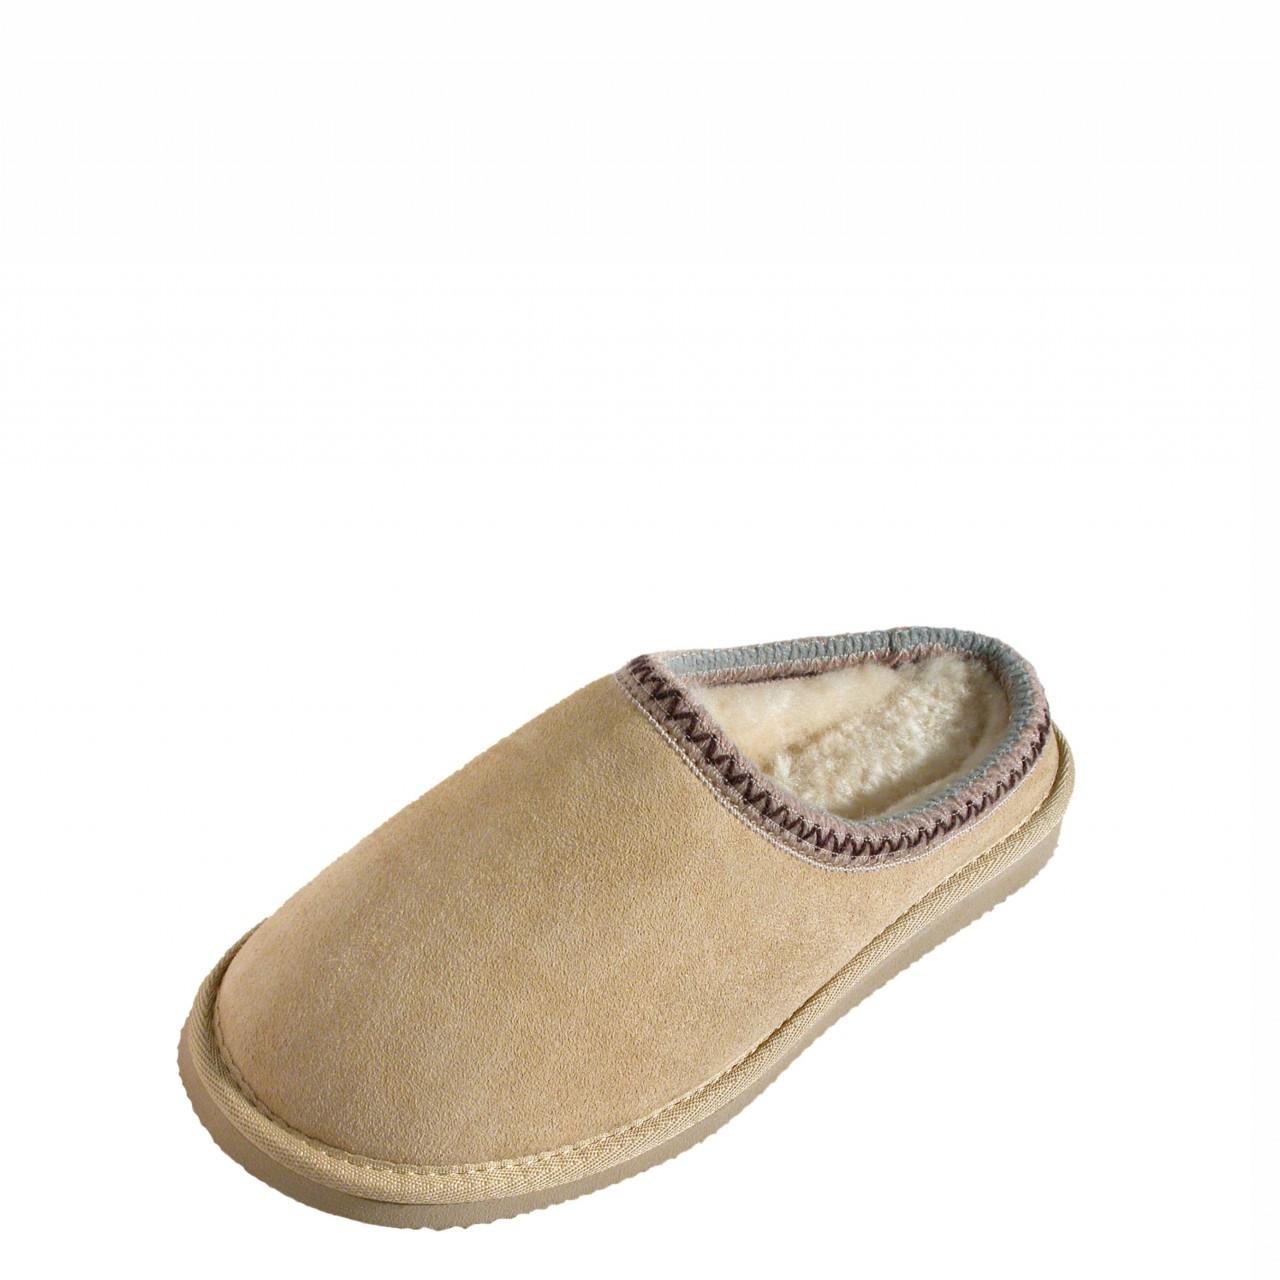 fe4172aafb534 Mi Woollies Apache Clog Slipper - Online Shopping